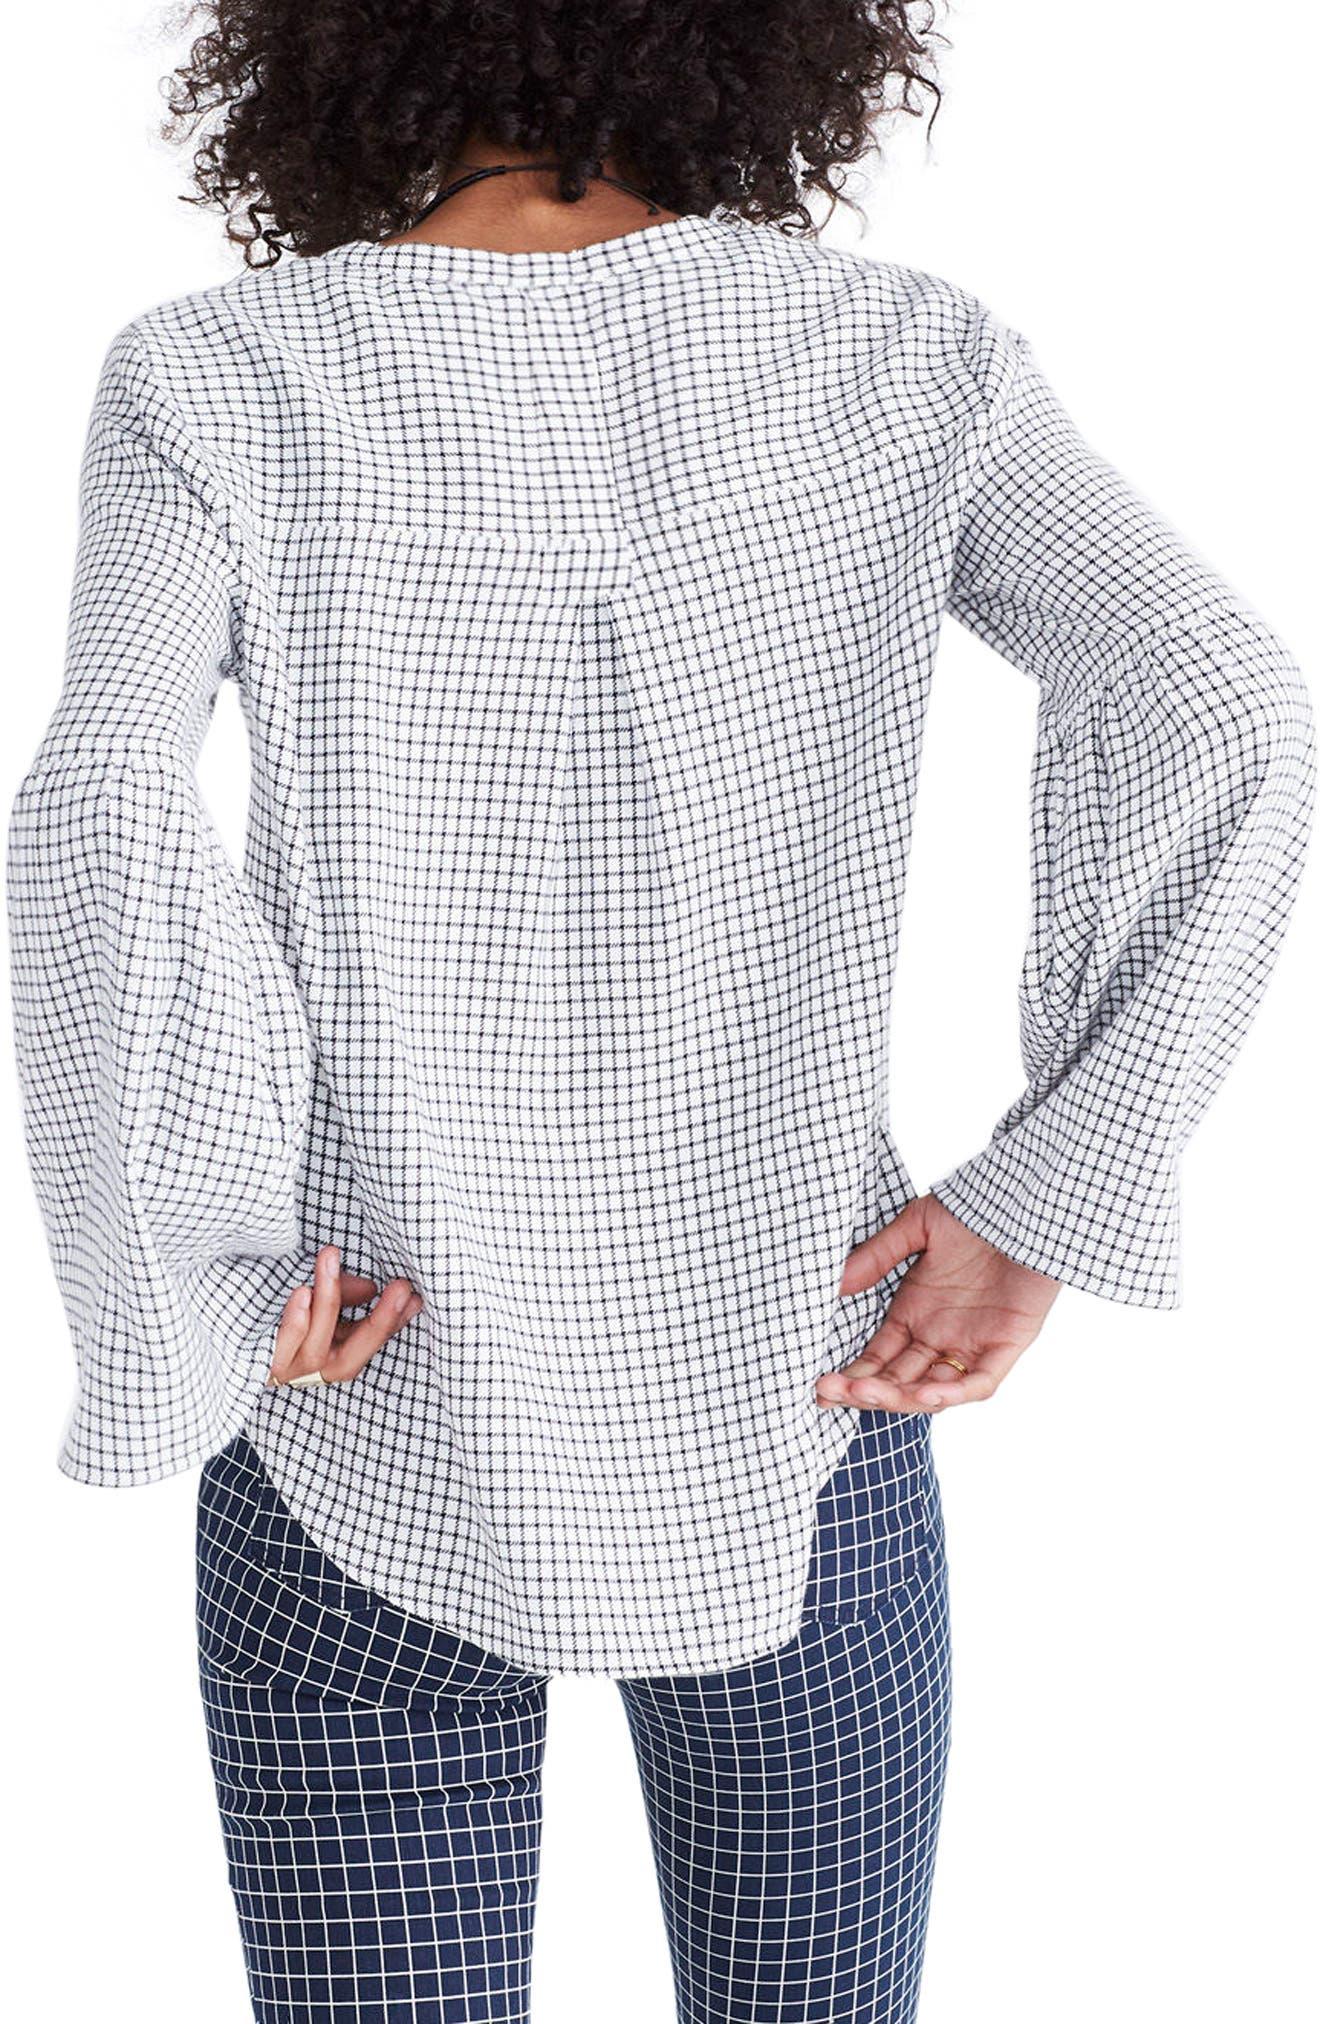 Bell Sleeve Plaid Shirt,                             Alternate thumbnail 2, color,                             109